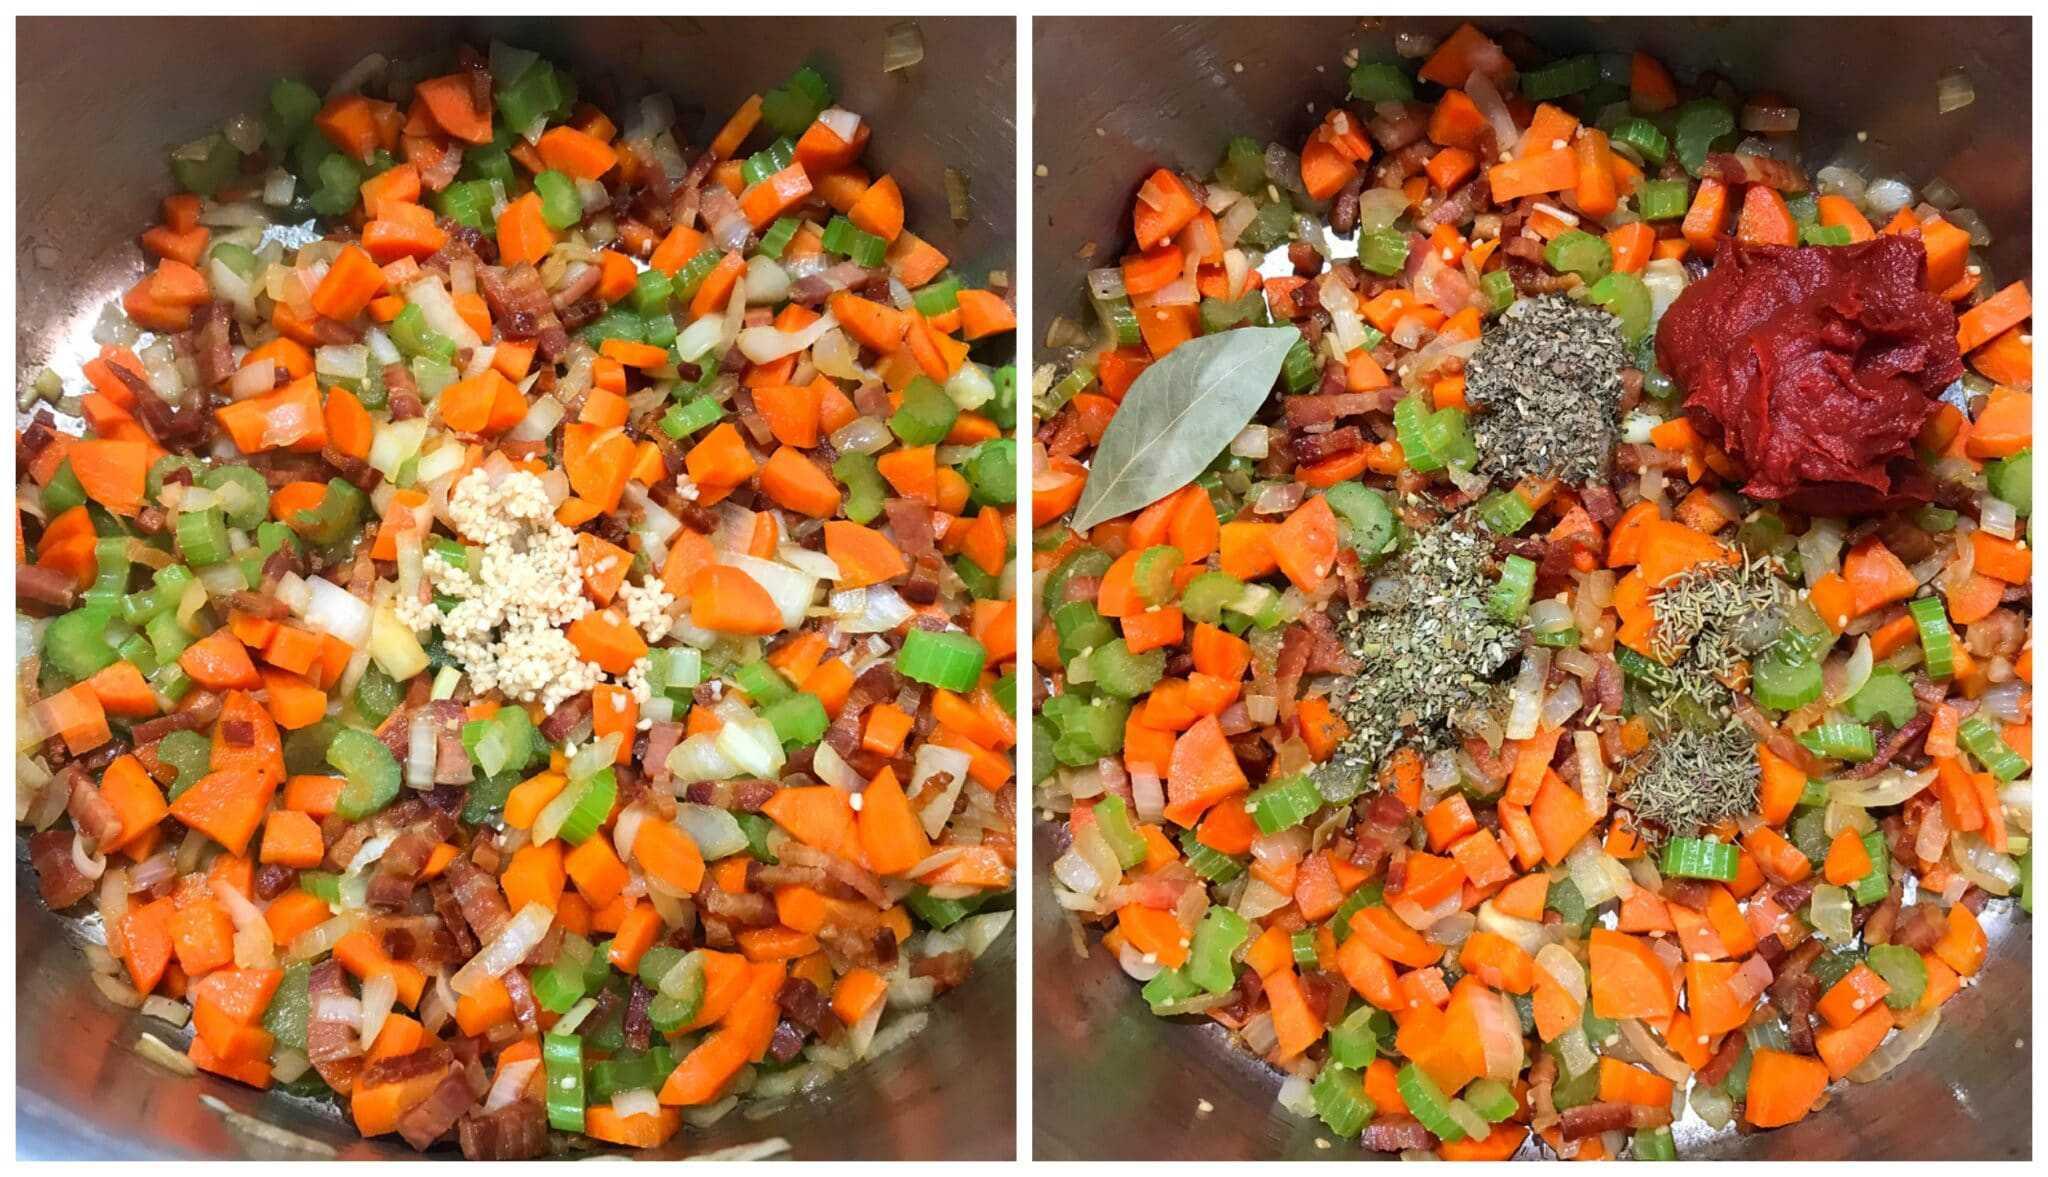 add garlic and herbs